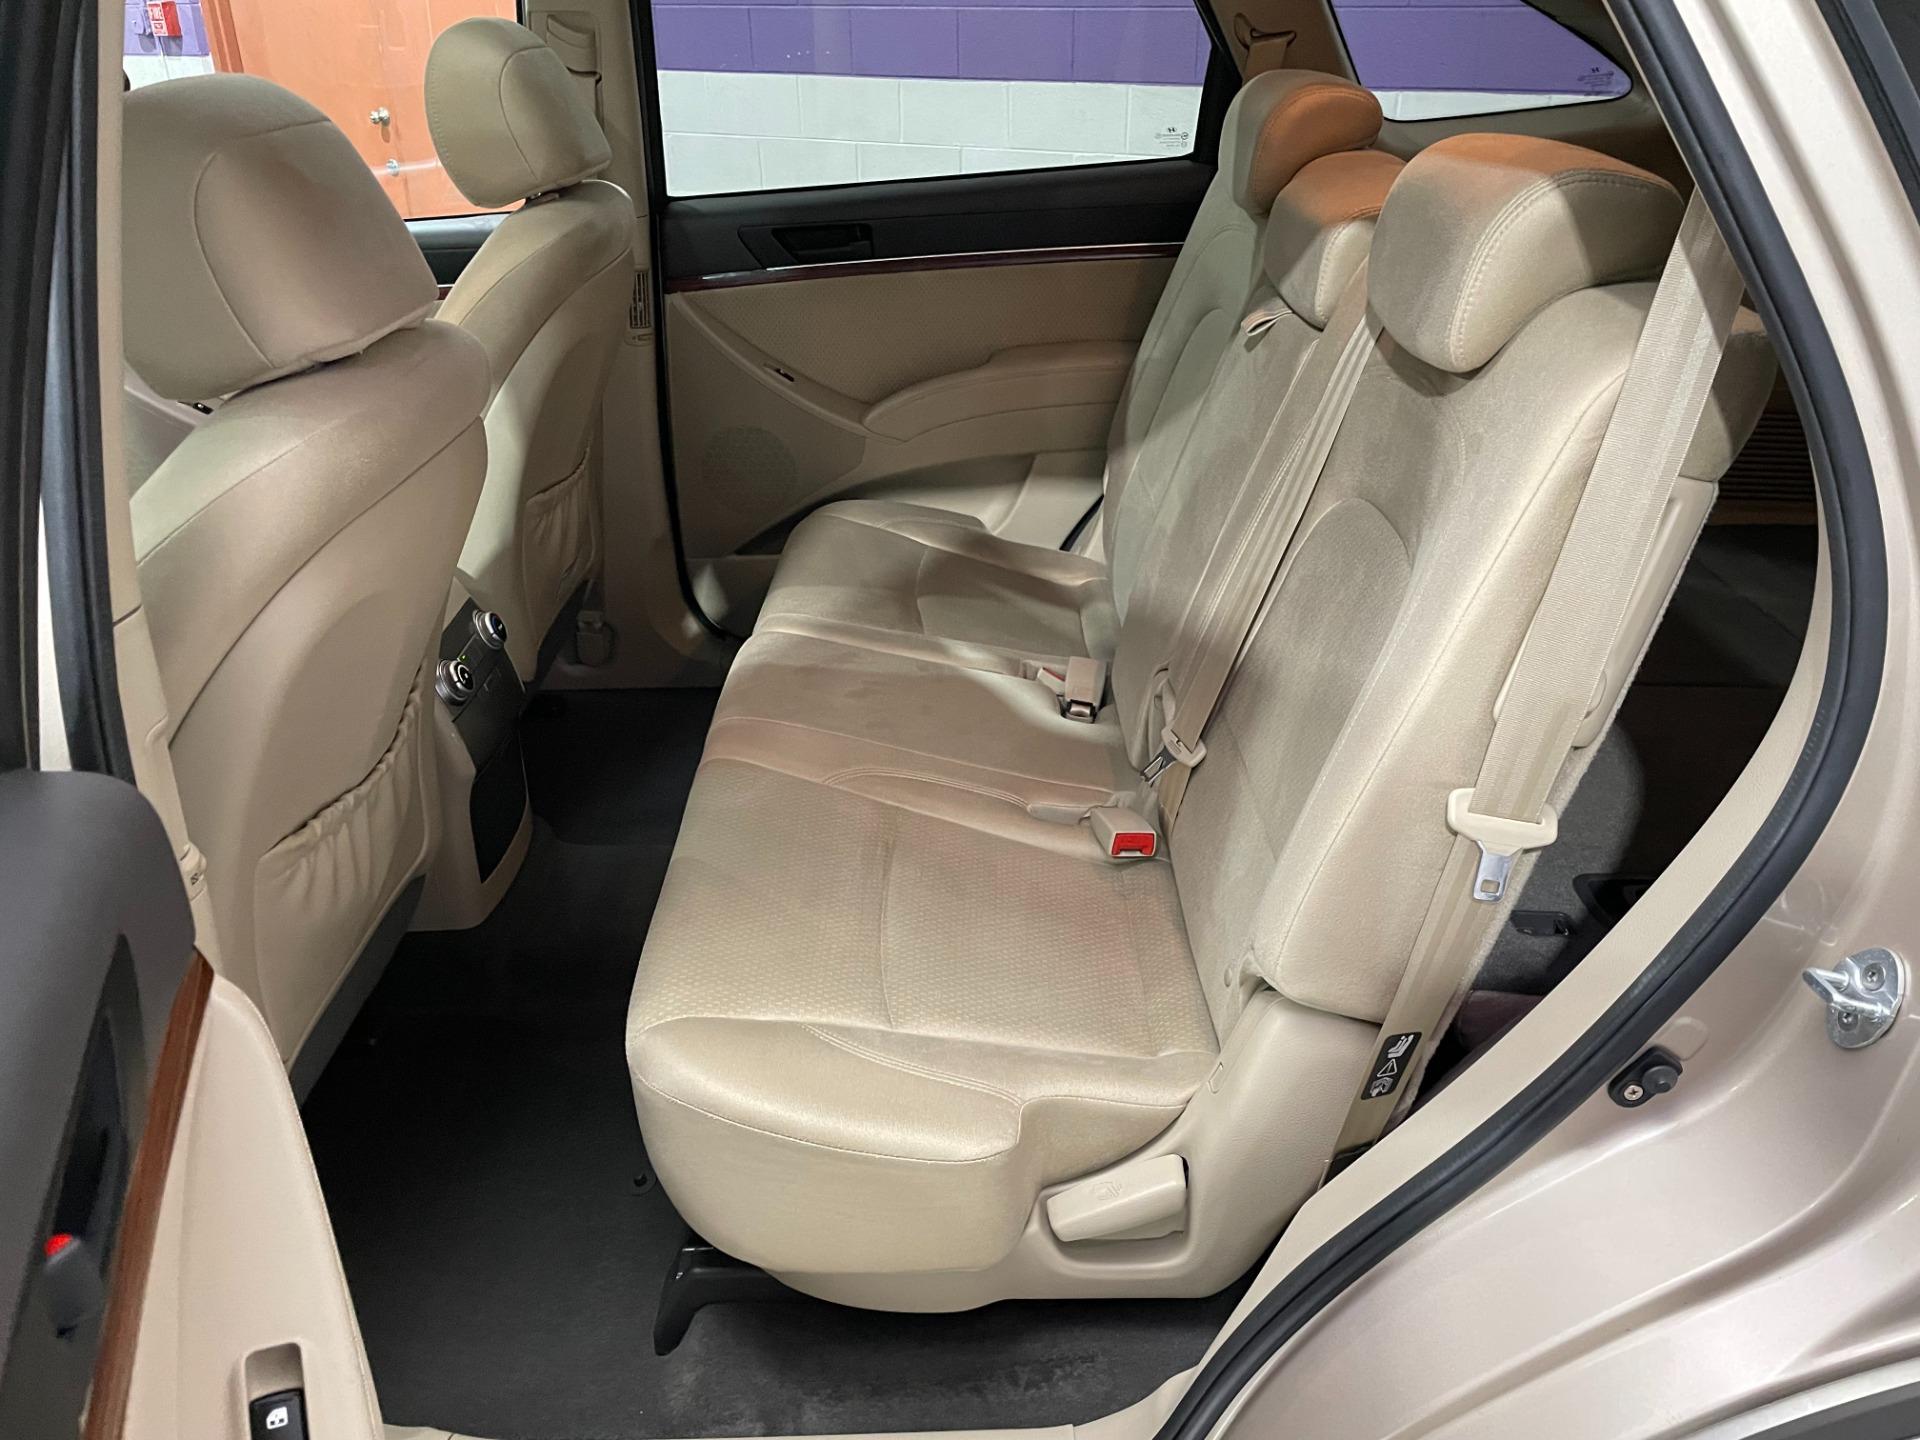 Used-2009-Hyundai-Veracruz-GLS-FWD